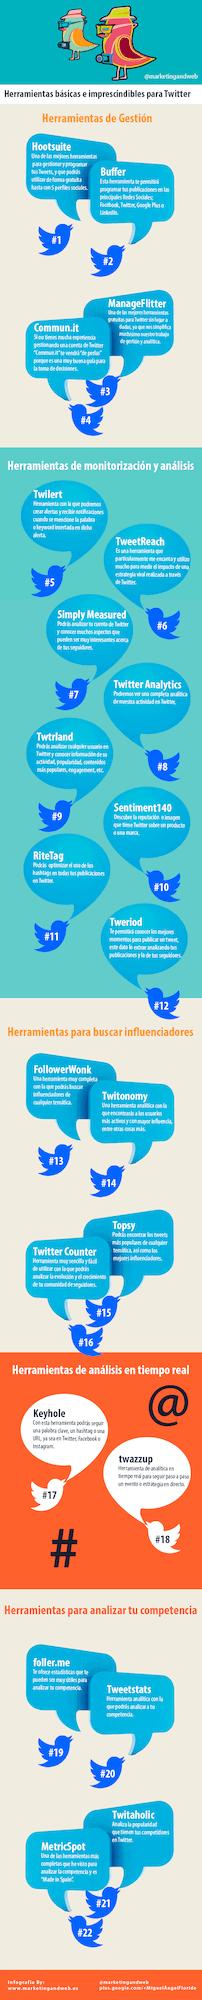 herramientas básicas e imprescindibles para twitter